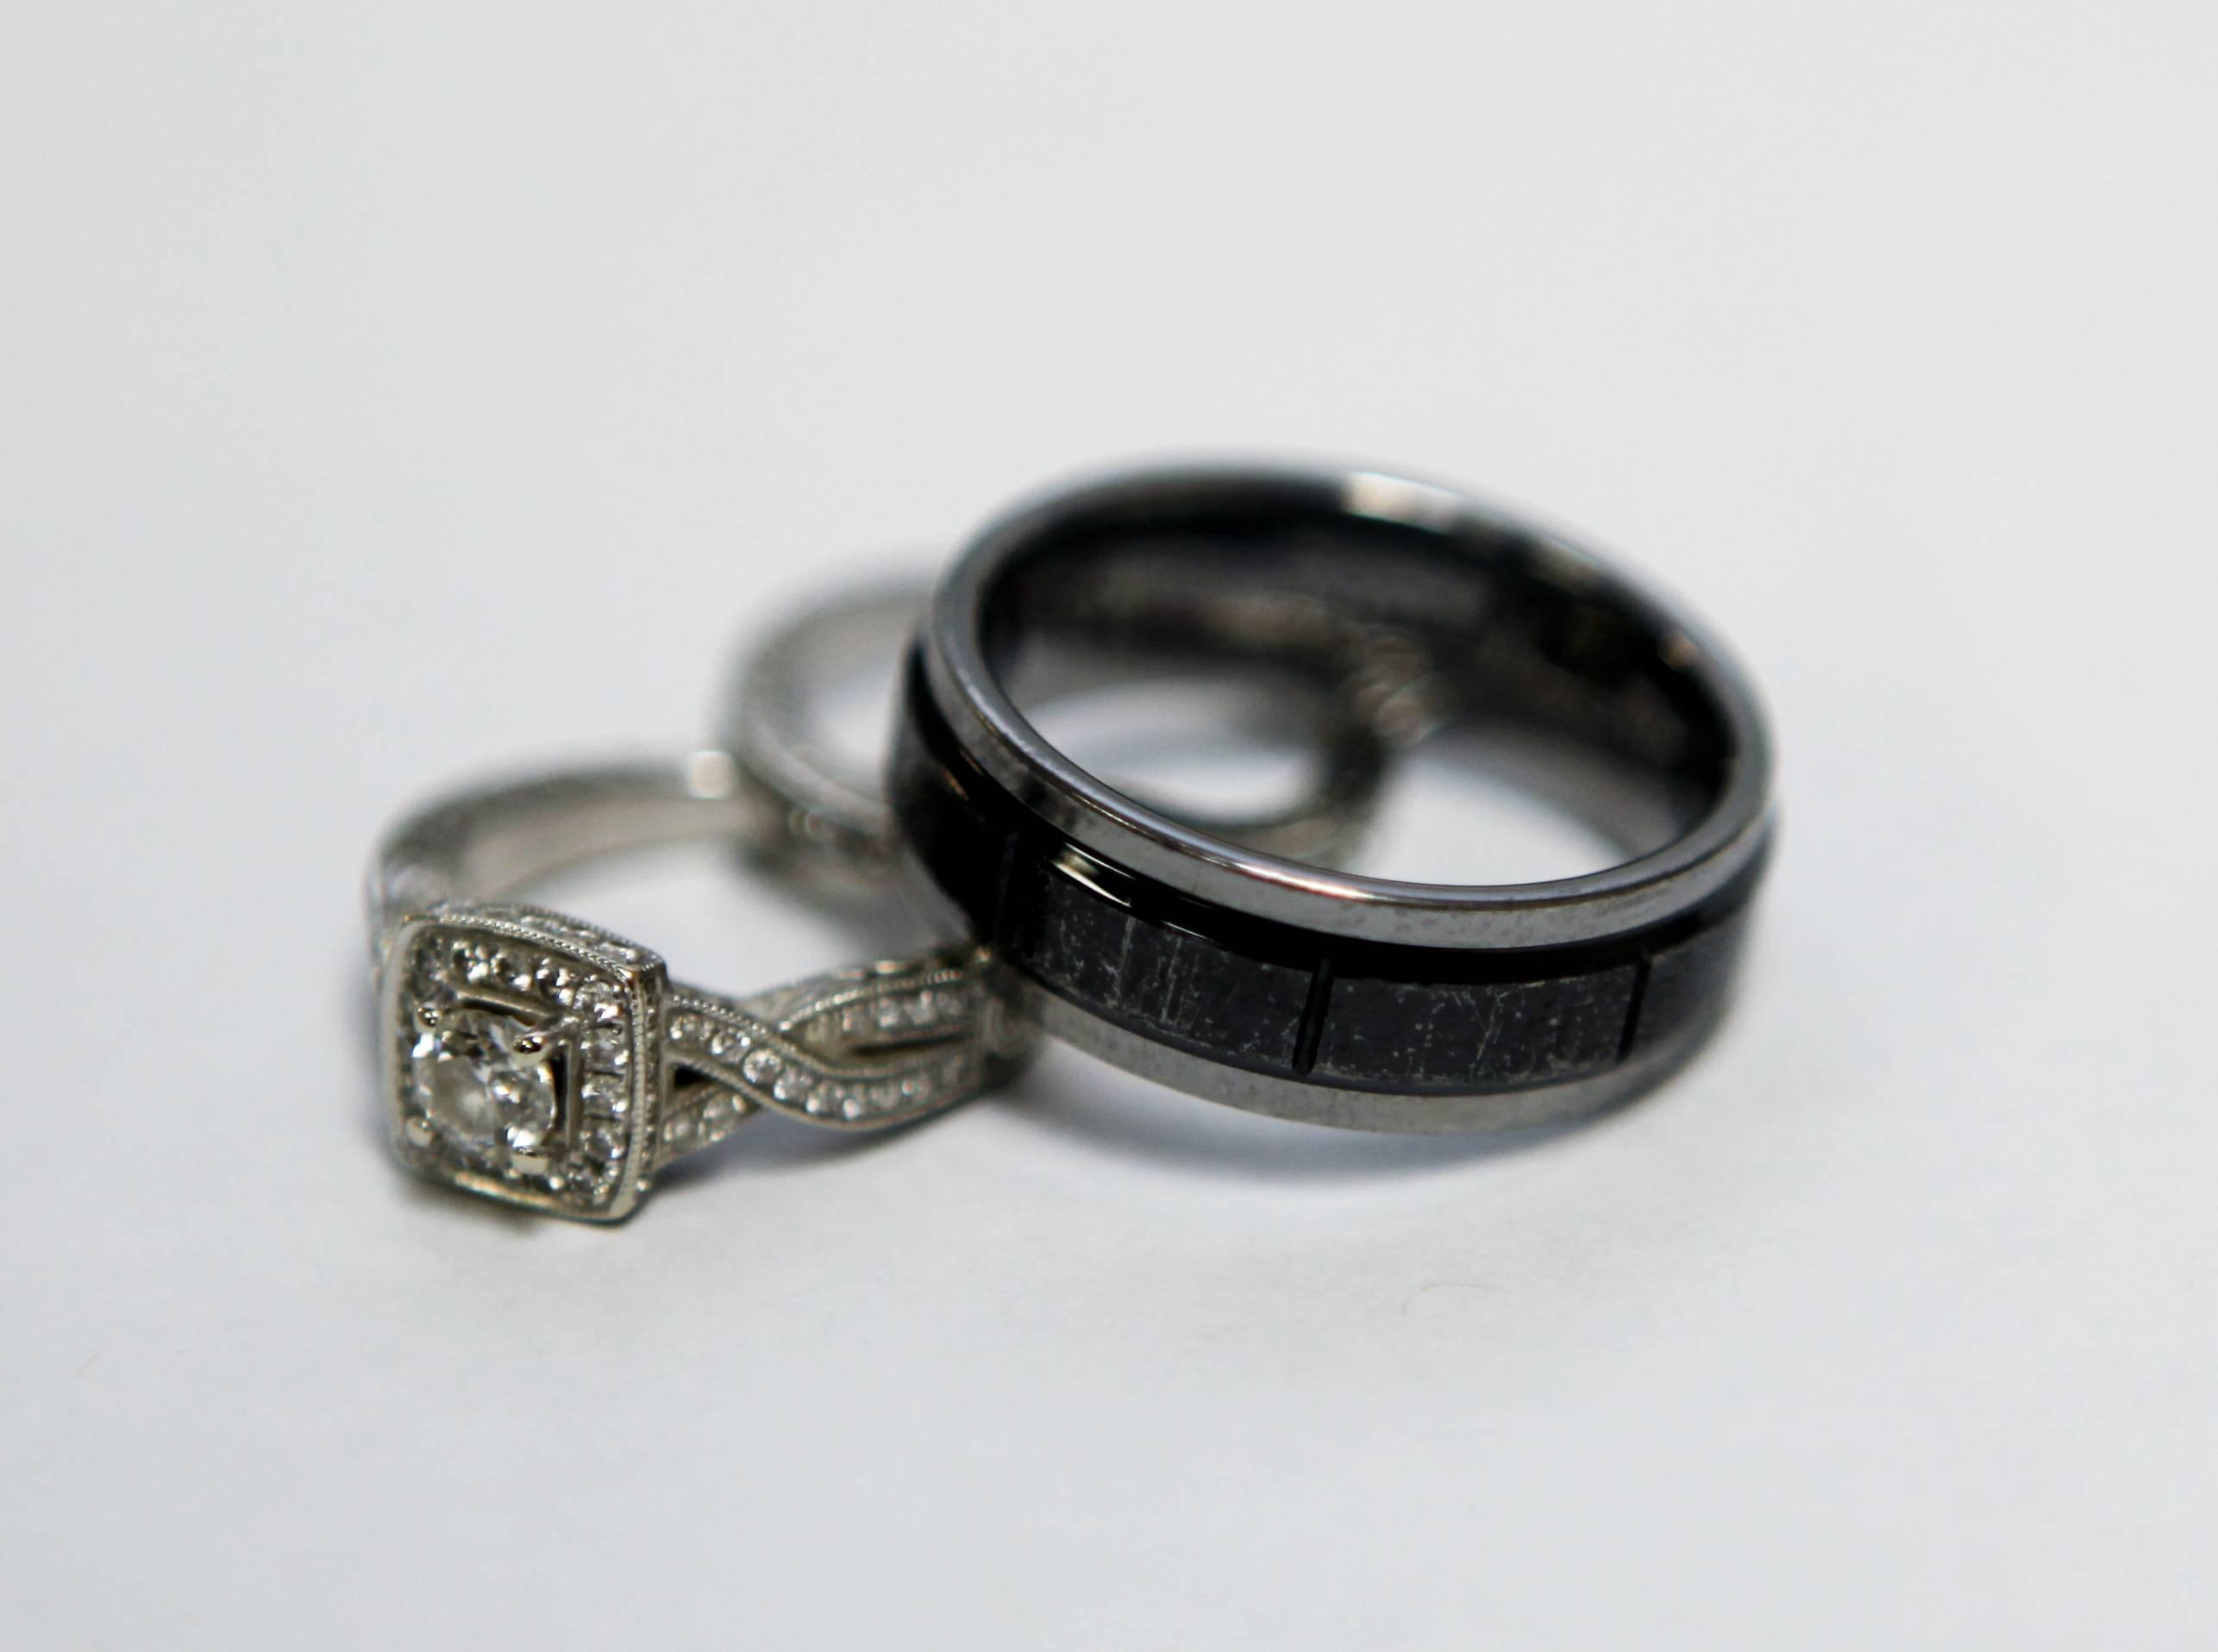 Charming Ideas Marine Wedding Rings Marine Corps Wedding Rings With Marine Corps Wedding Bands (View 2 of 15)